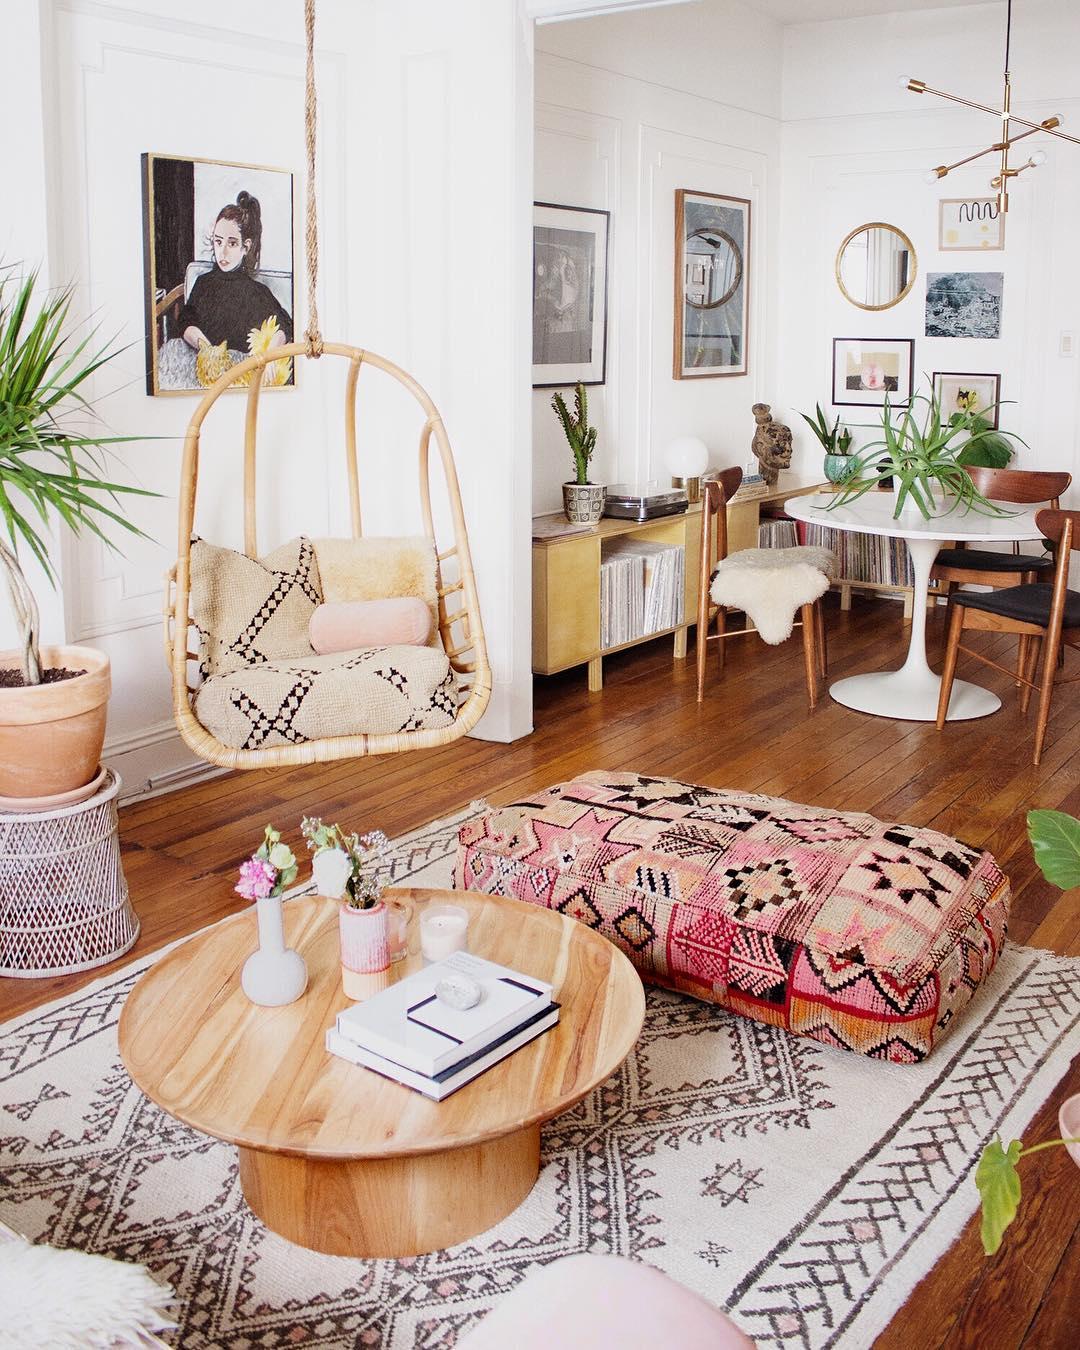 10 Aesthetic Boho Furniture Ideas You Should Have Talkdecor